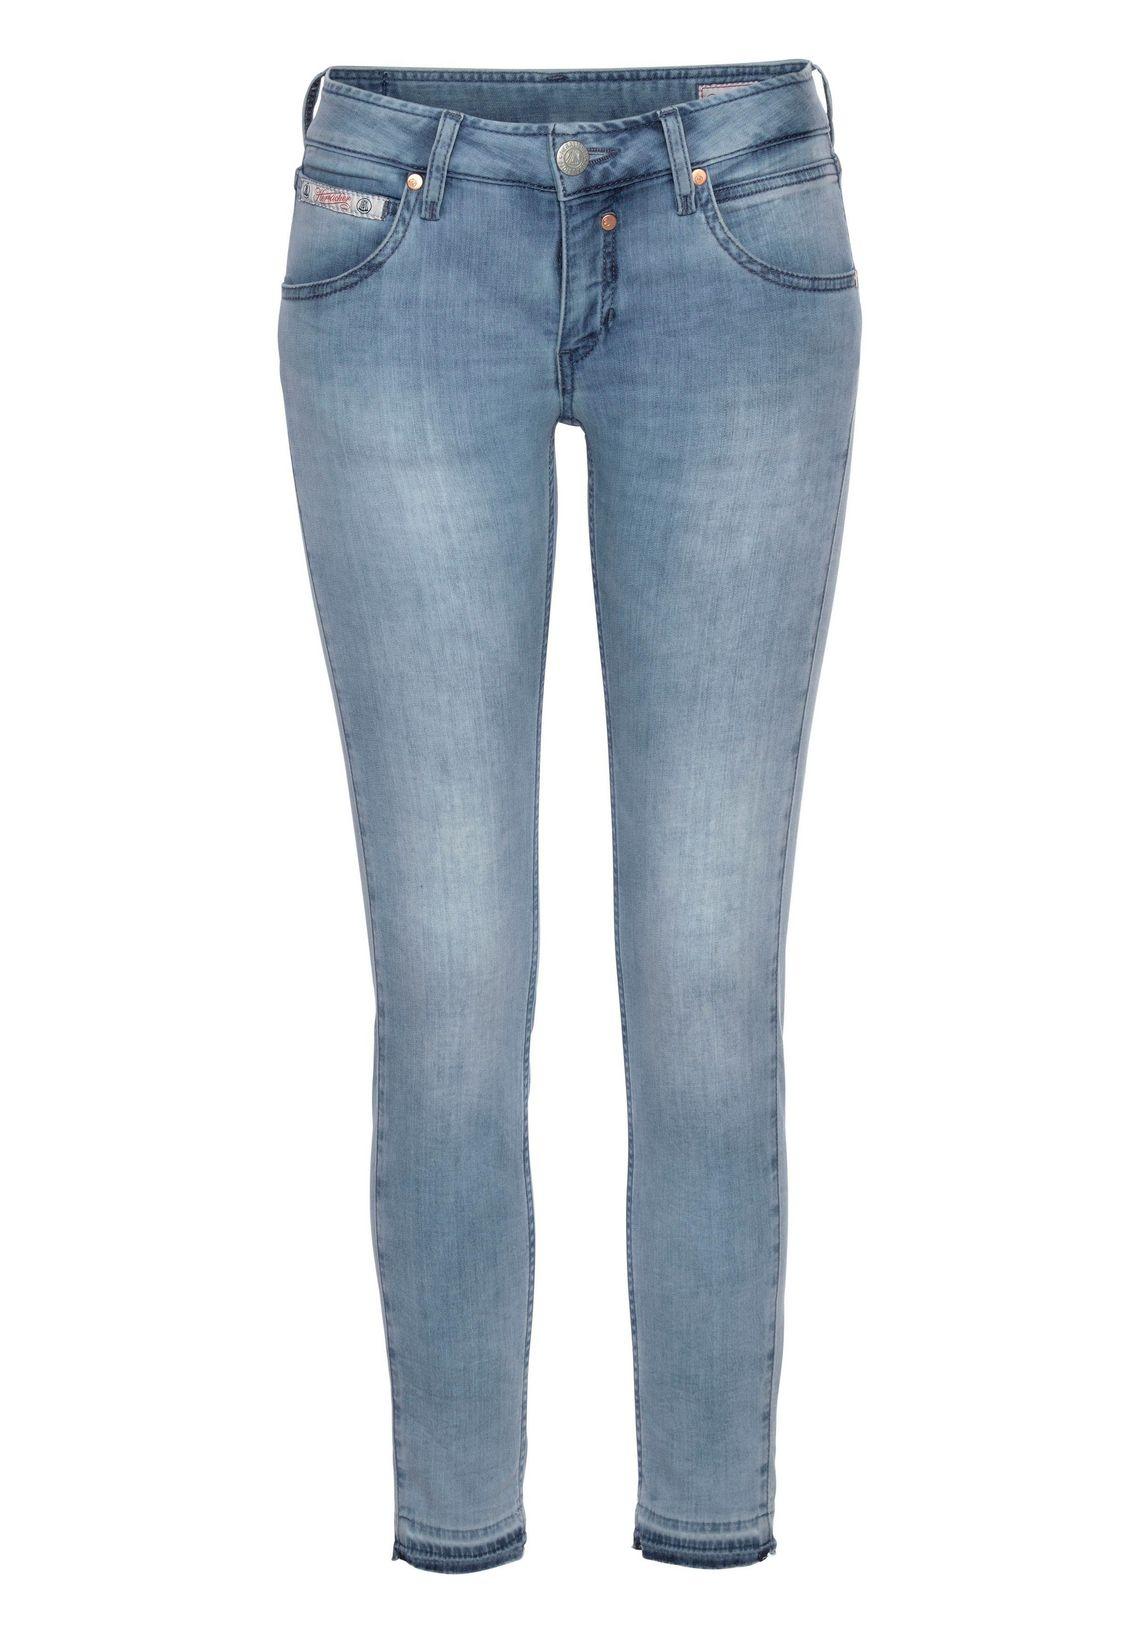 Herrlicher Ankle Jeans Touch Cropped Online Bestellen Light-blue wGtfiQIy